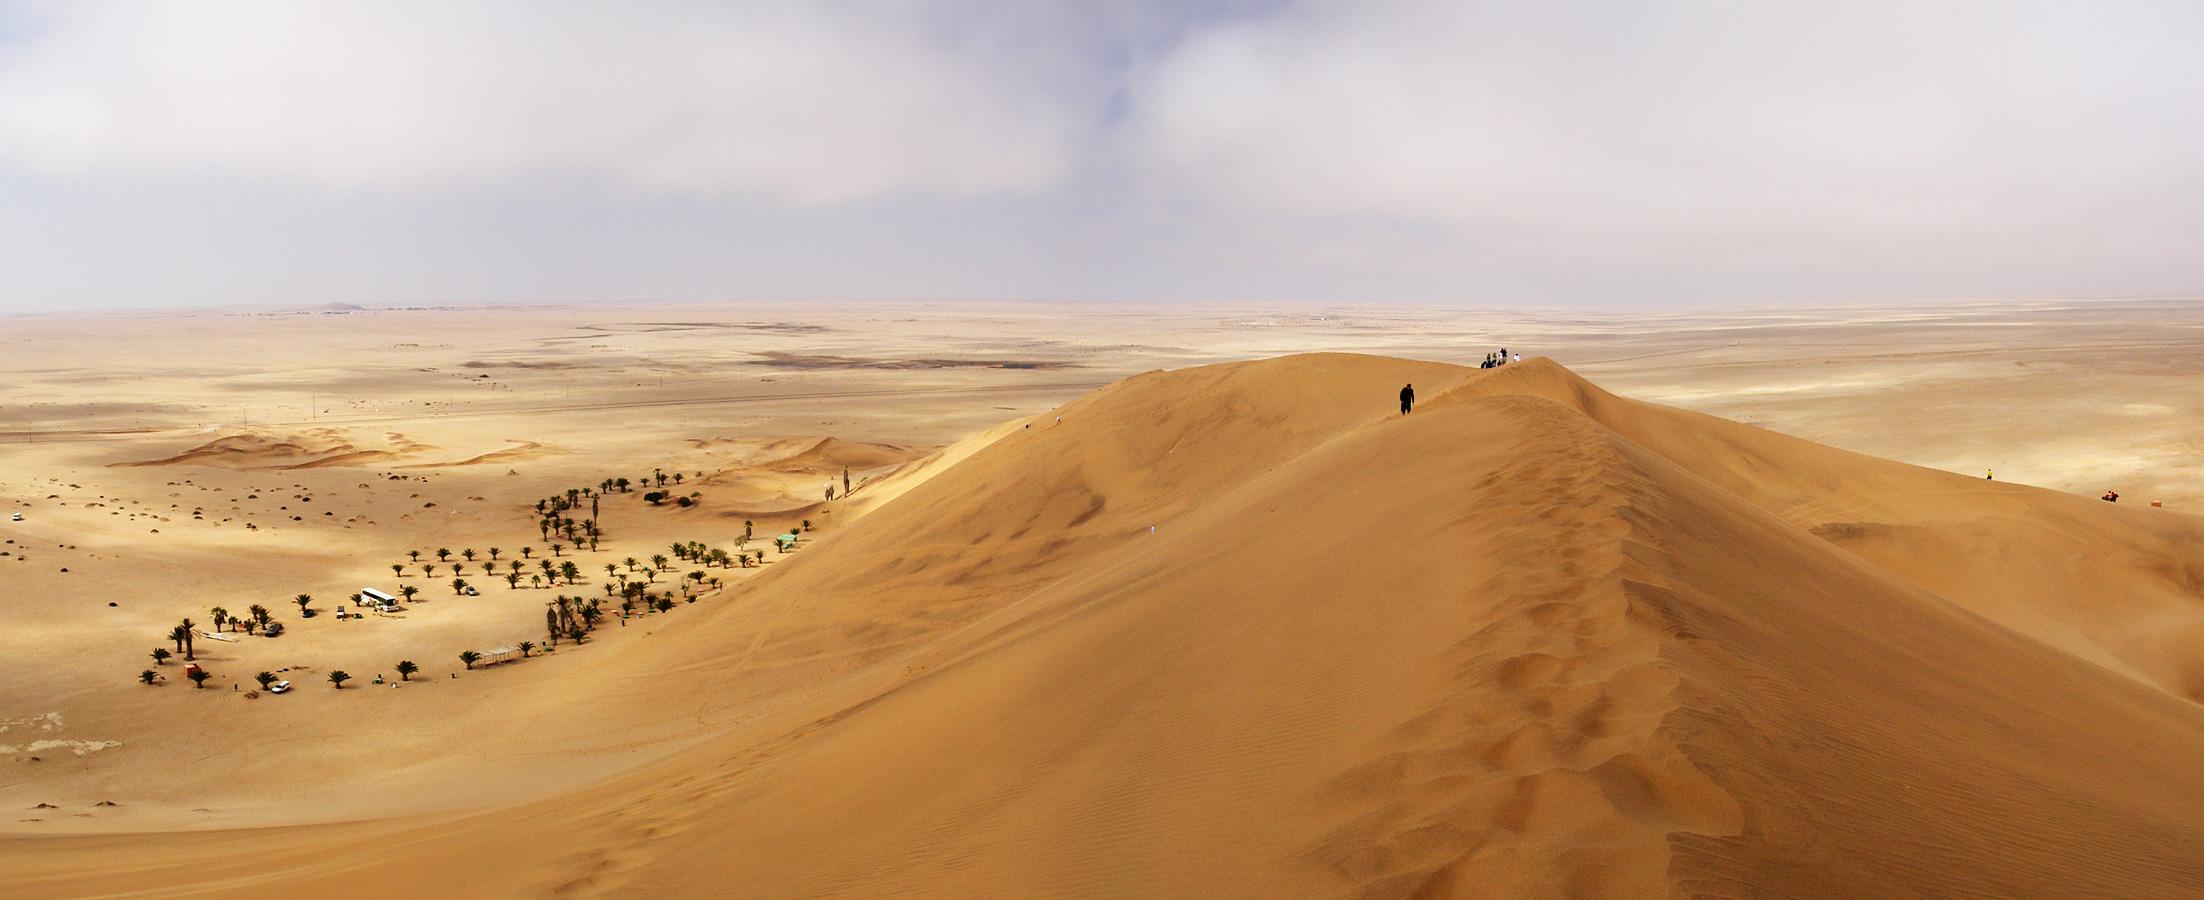 Deserto da Namíbia (Foto: Damien du Toit/Flickr/Creative Commons)